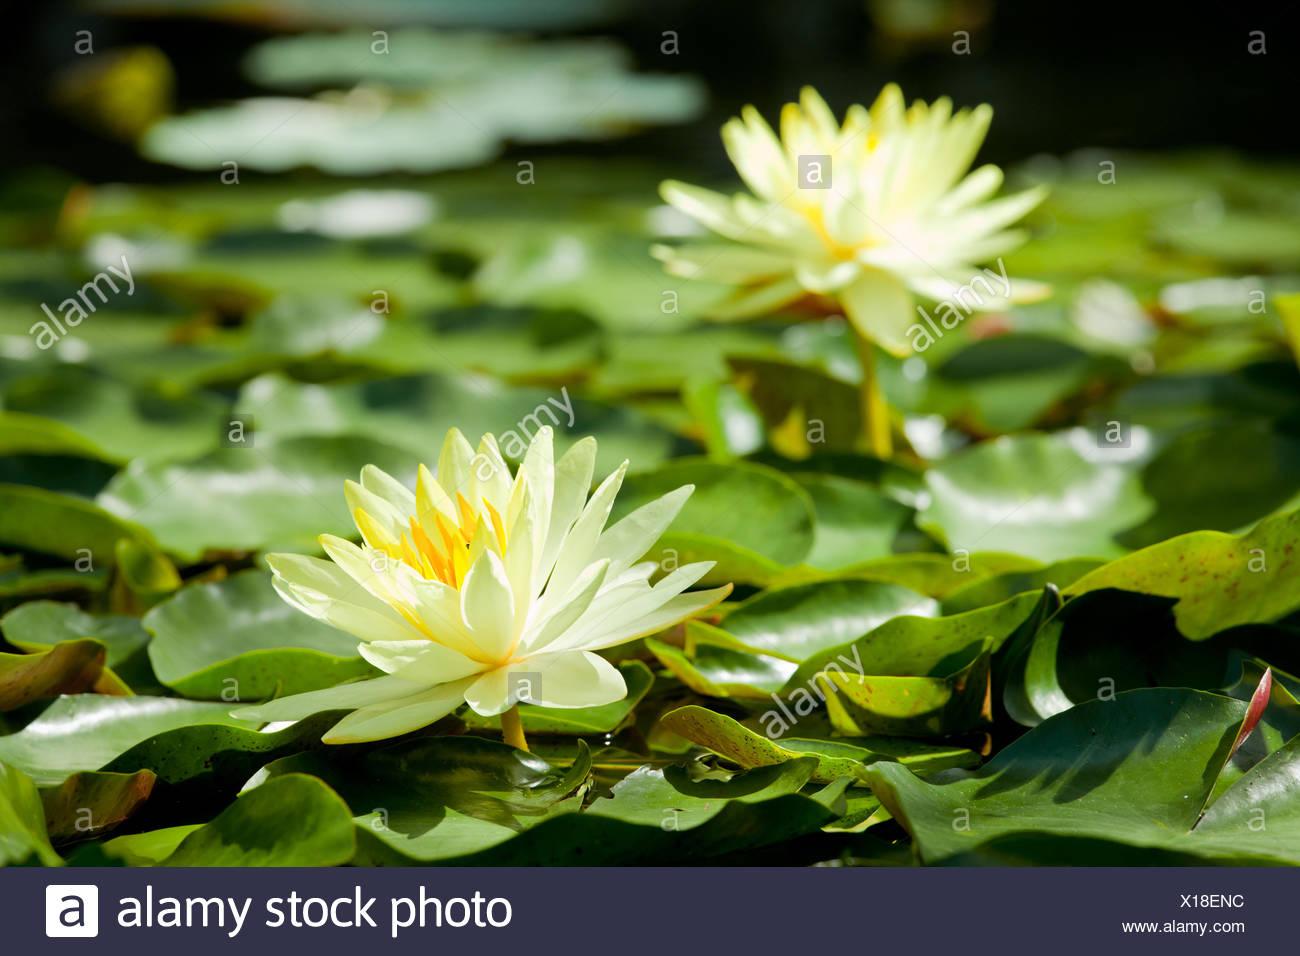 Real Lake Lotus Flowers Wild Stock Photos Real Lake Lotus Flowers